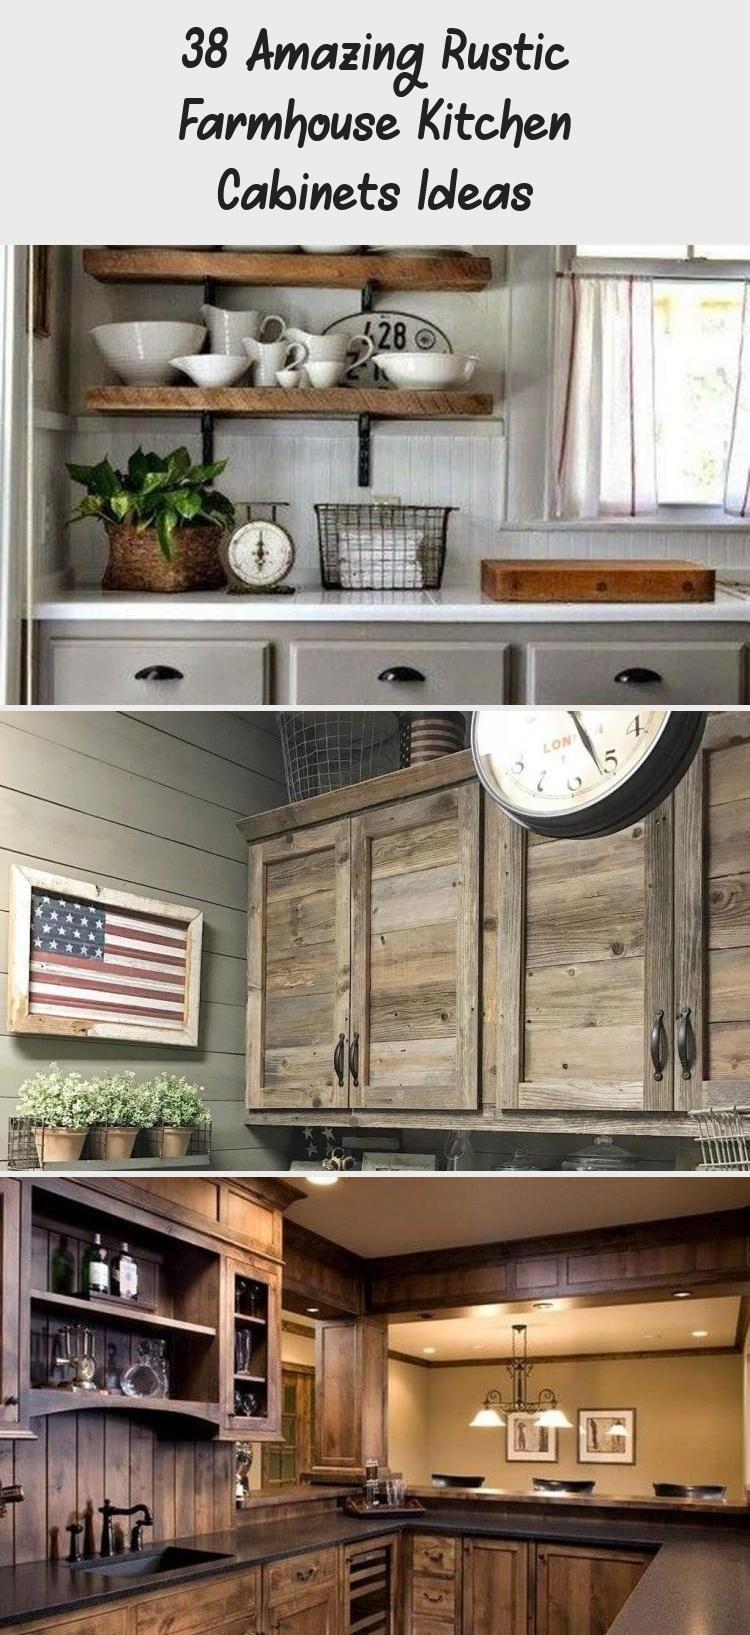 10+ Amazing Rustic Farmhouse Kitchen Cabinets Ideas Ideas